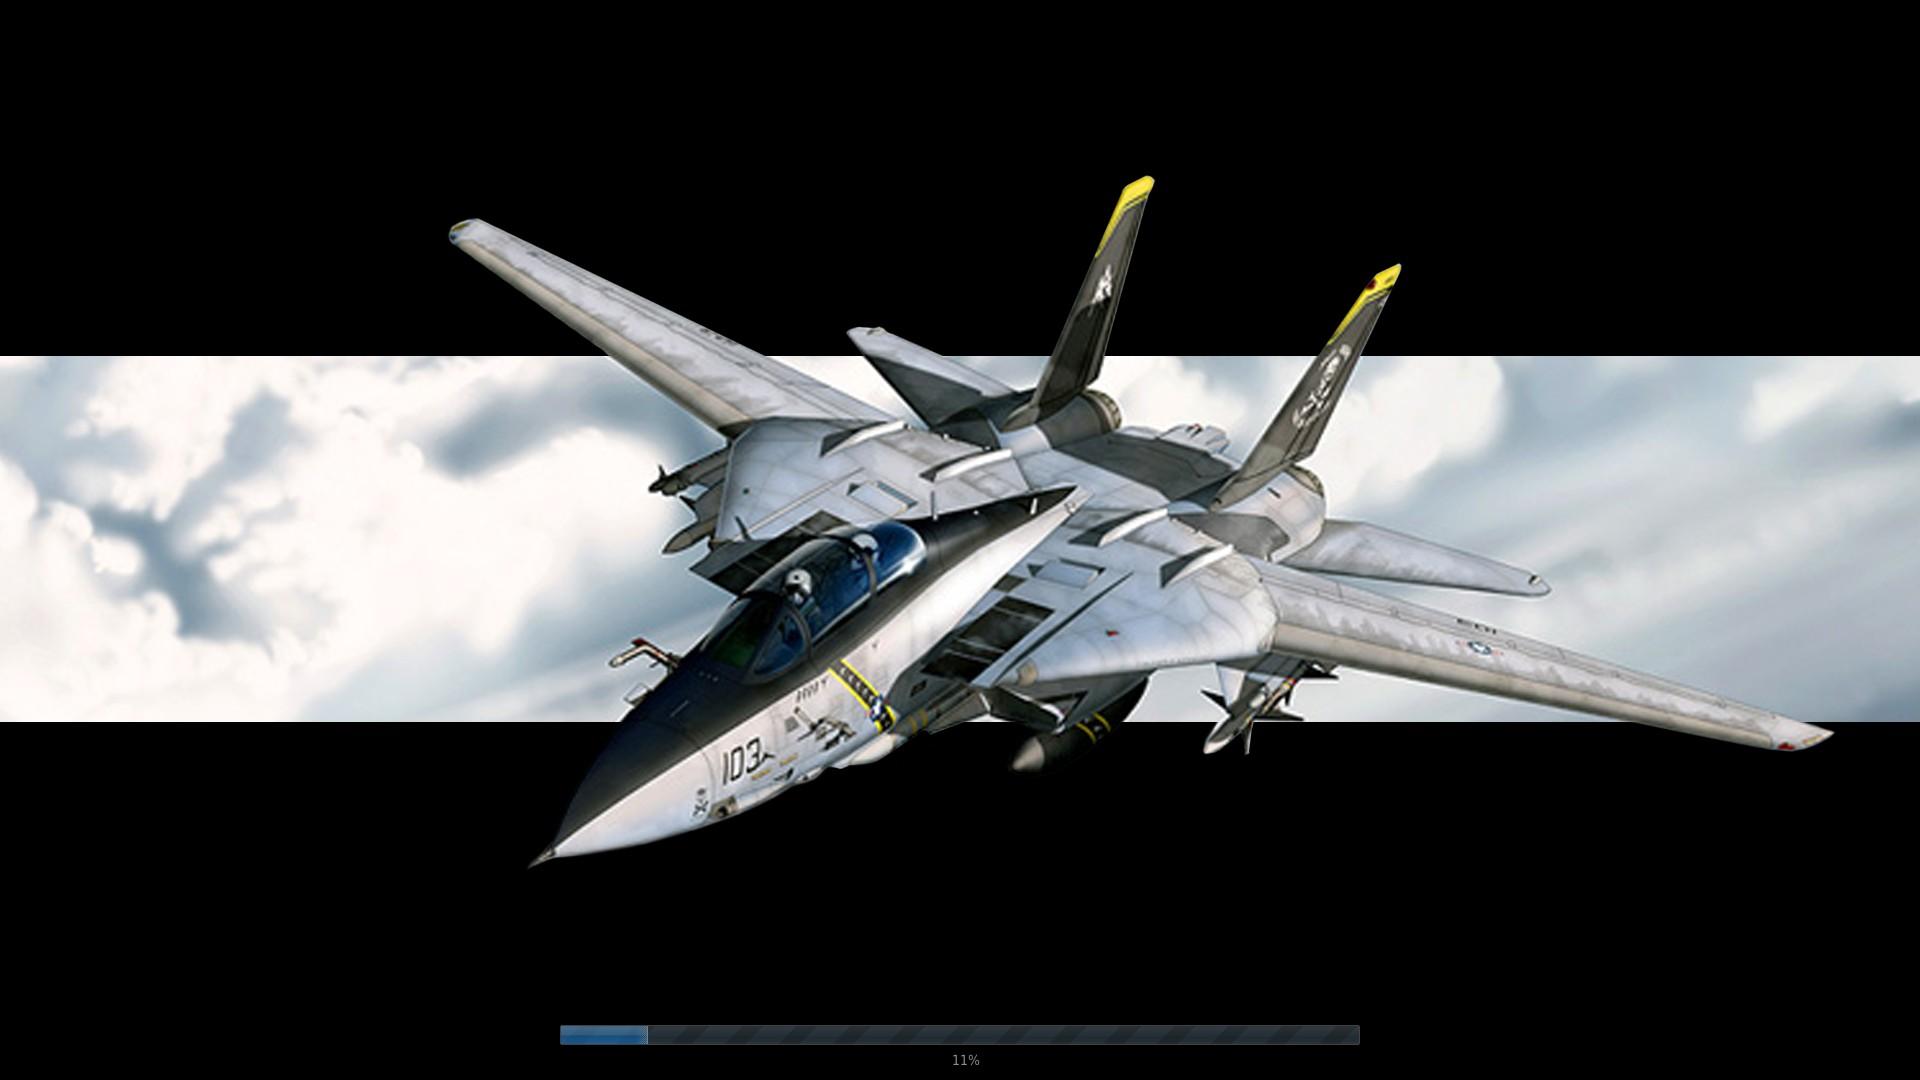 Apache tomcat 8.5.47 exploit github